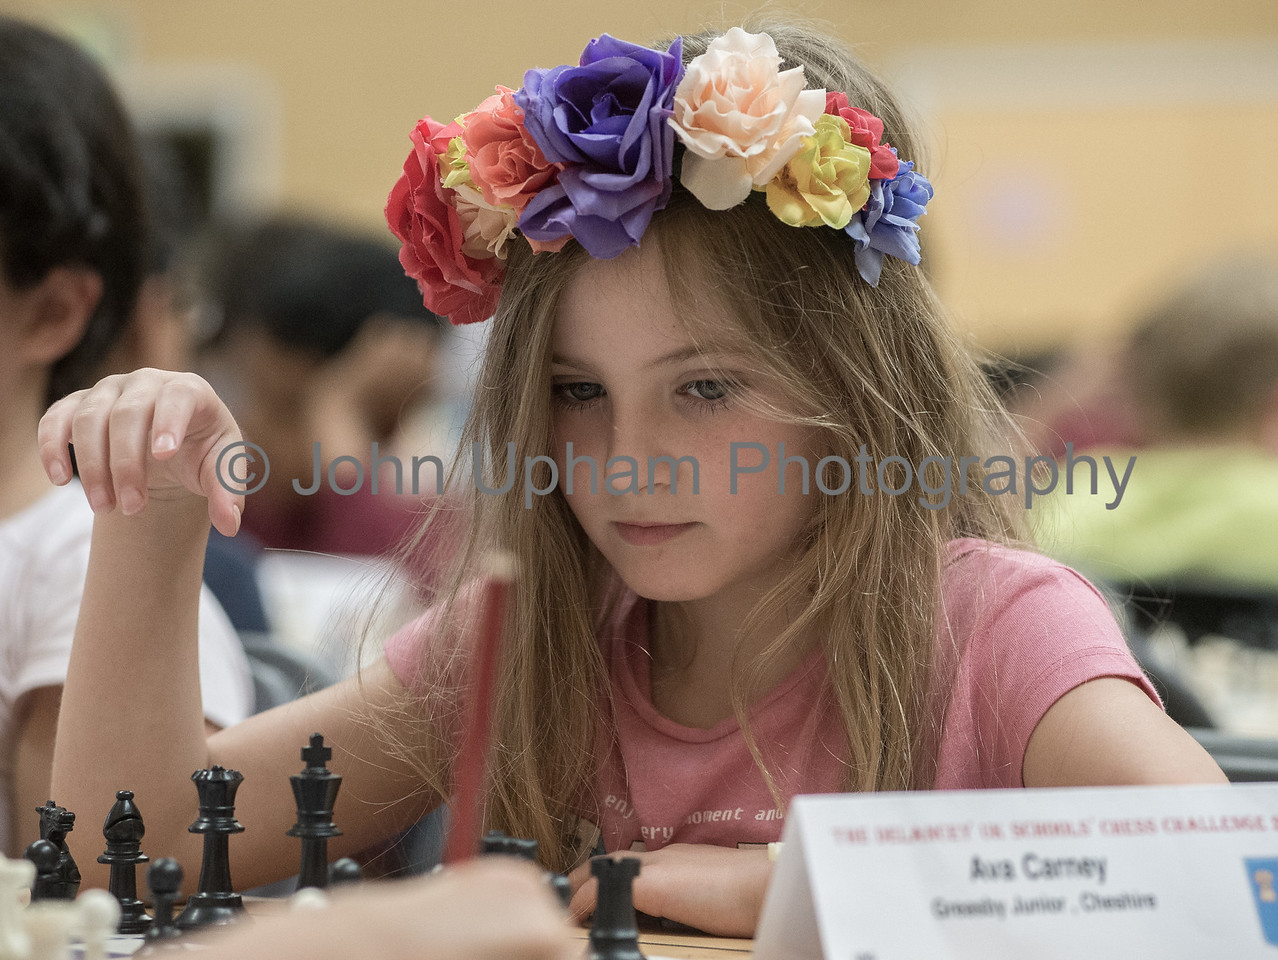 Ava Carney